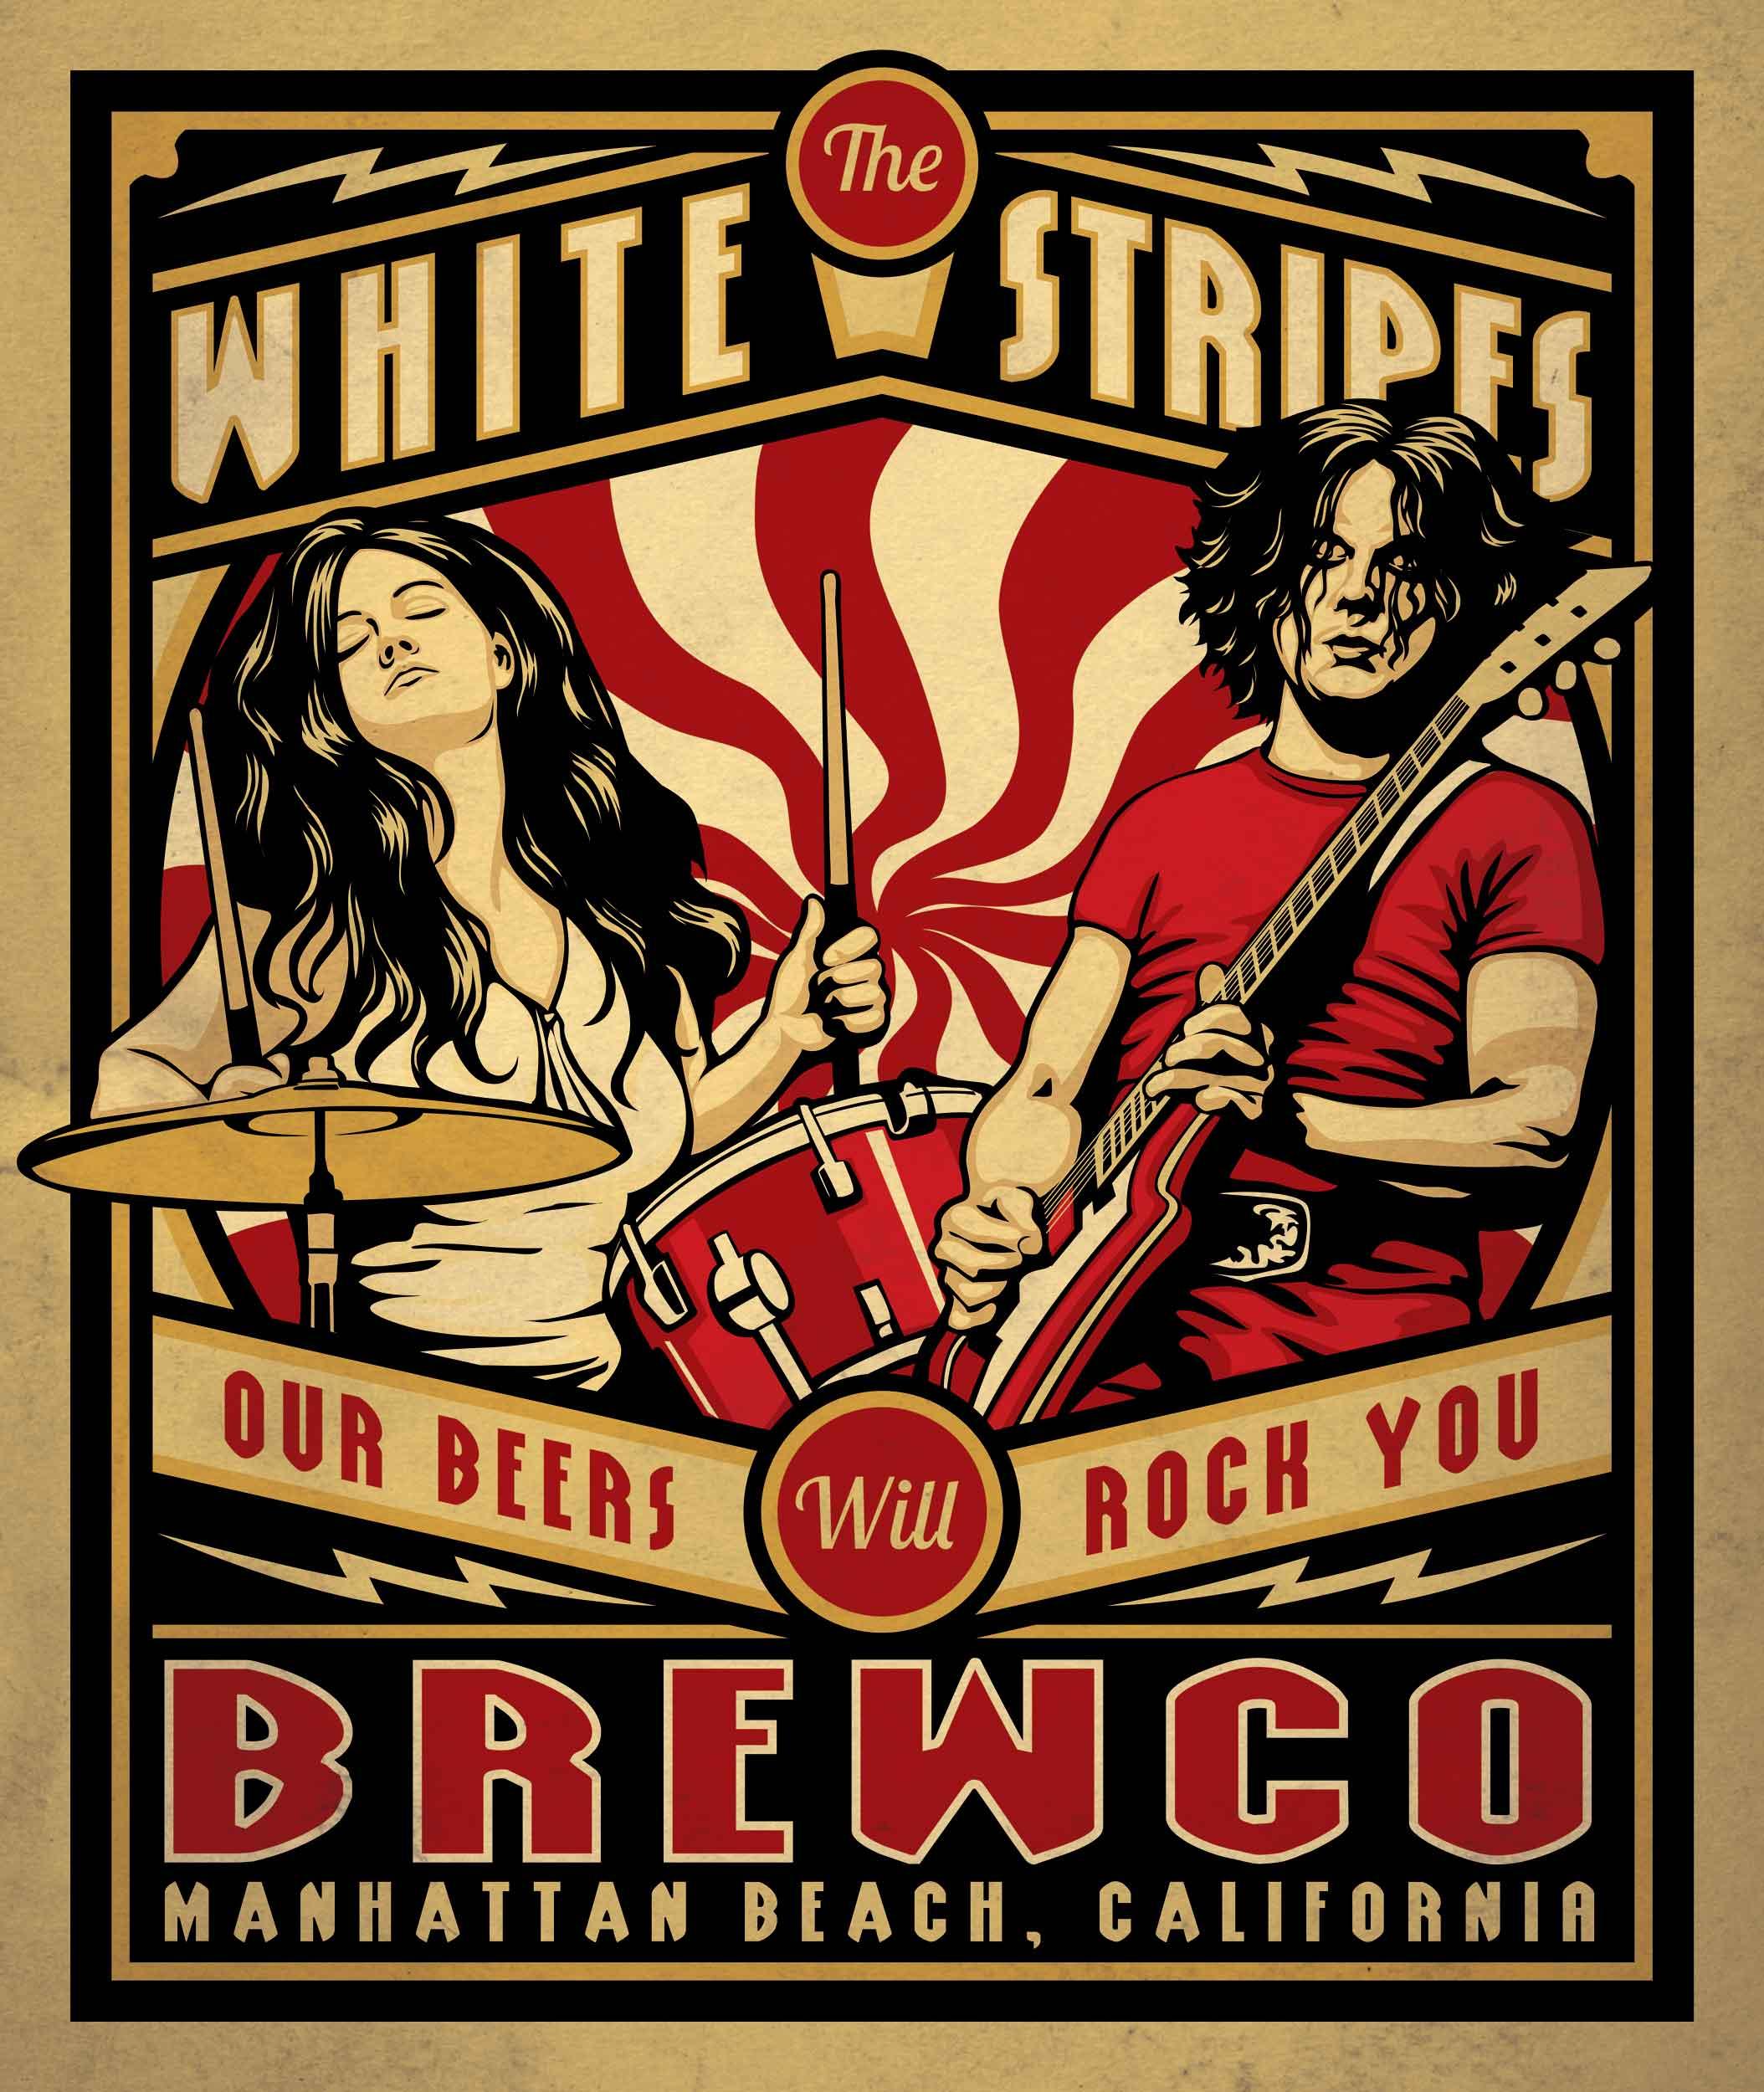 Brewco White Stripes poster